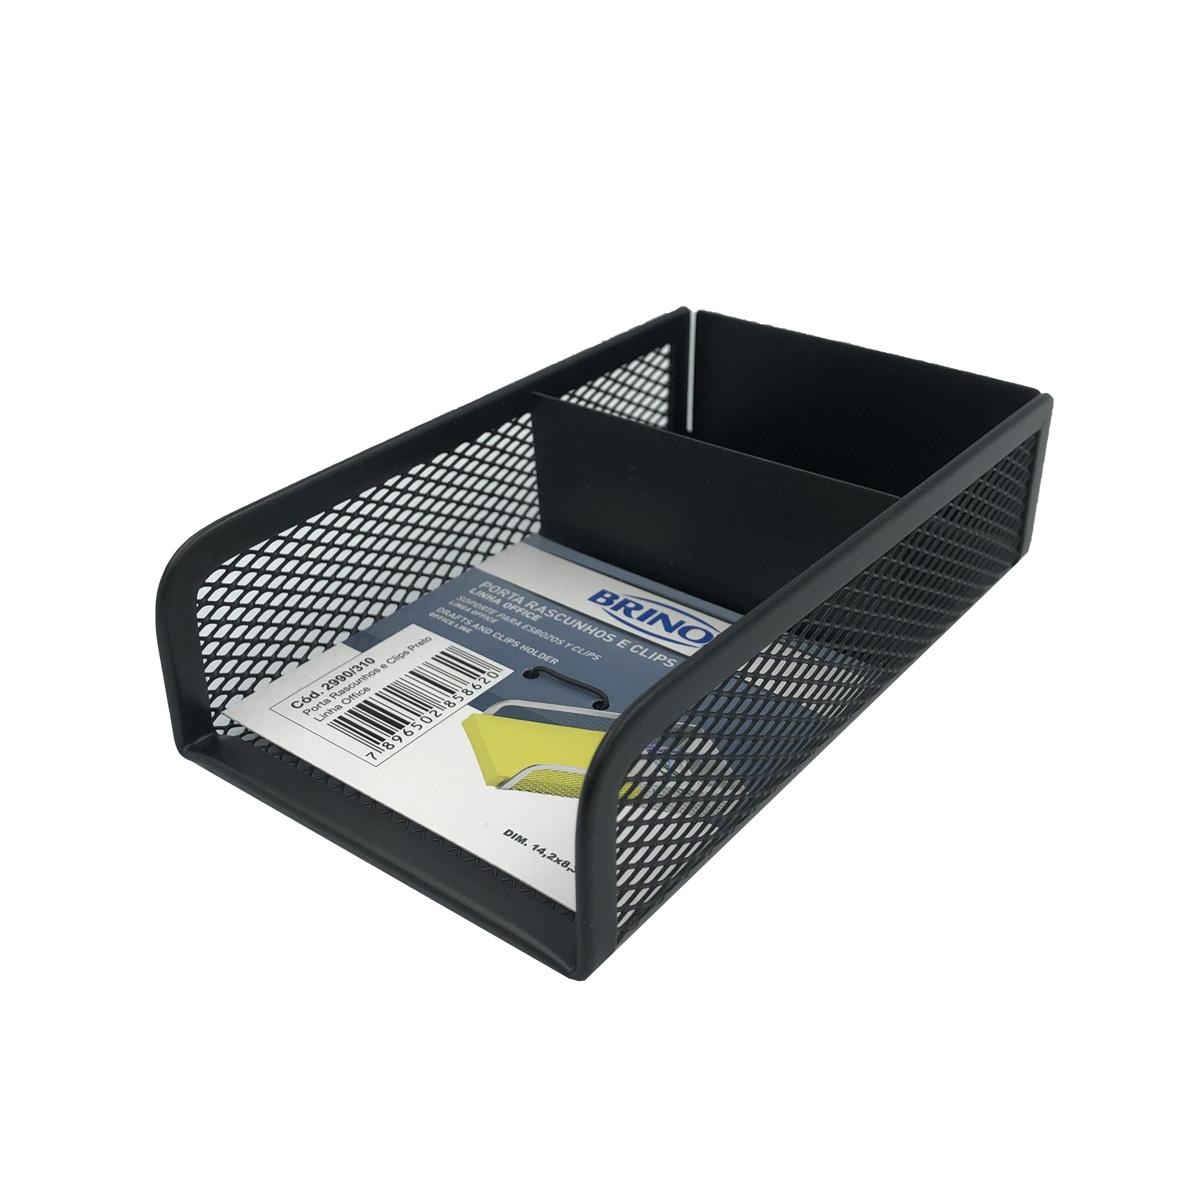 Organizador Porta Papel e Clips Office Preto 2990/310 Brinox